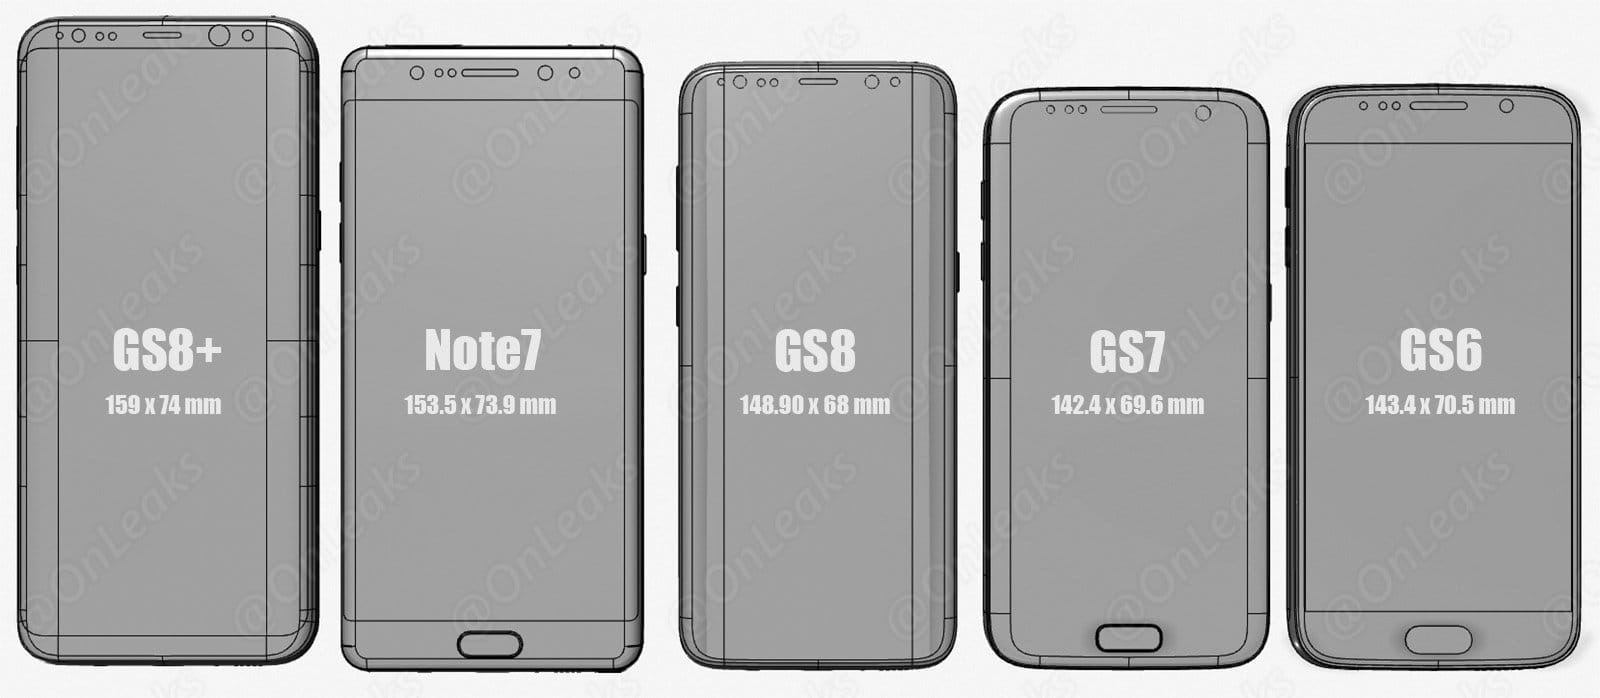 Samsung Galaxy S7 size iPhone 7 Plus 5